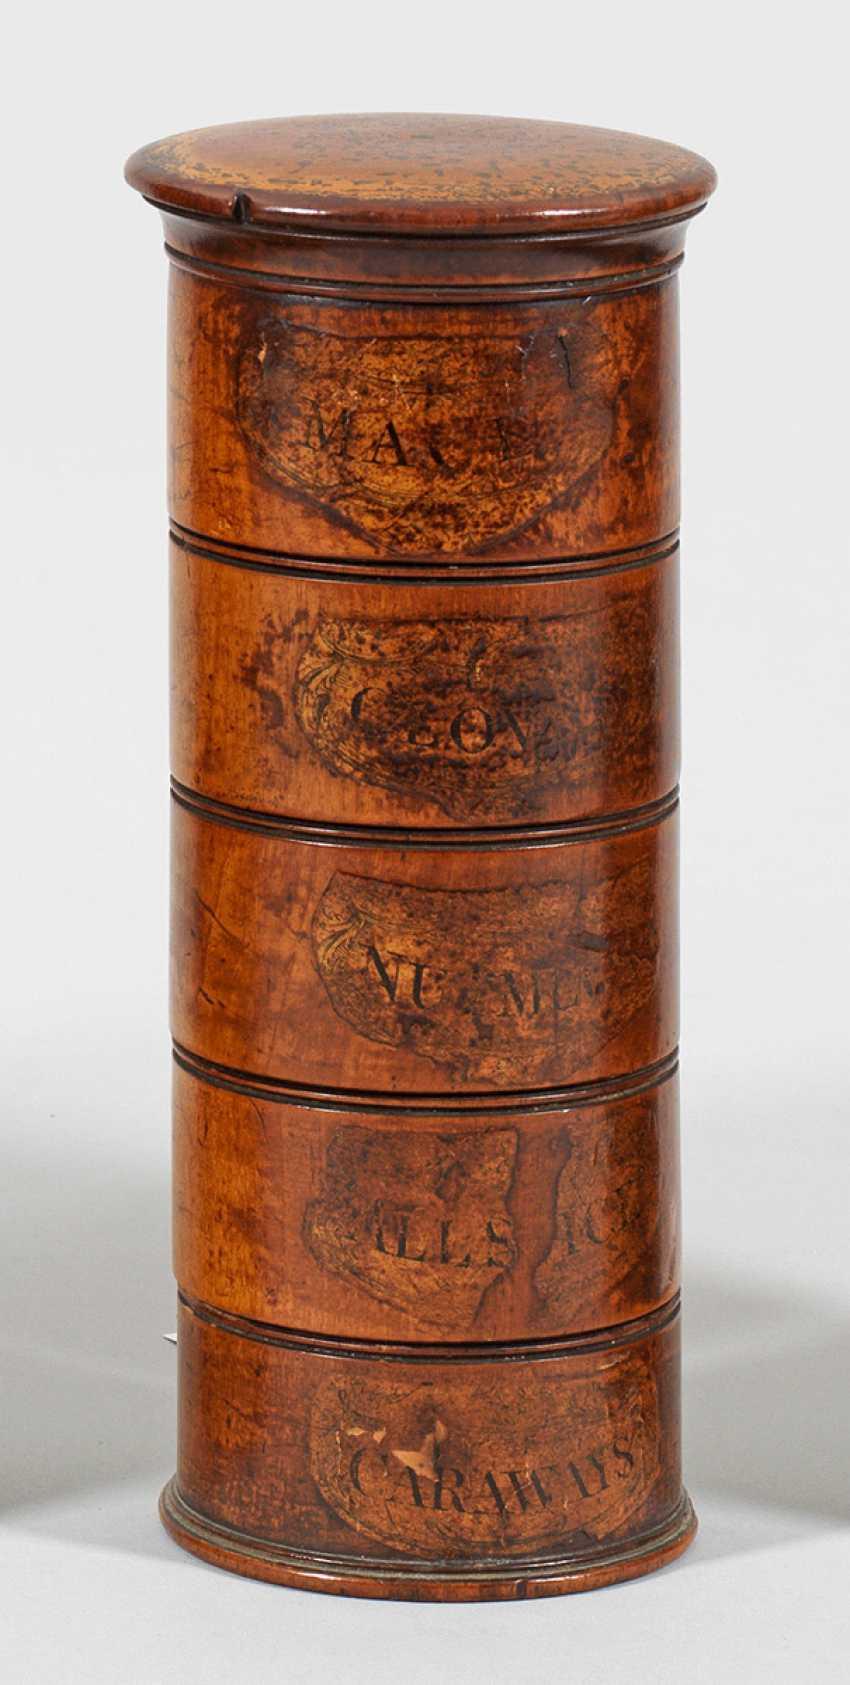 Spice jar - photo 1